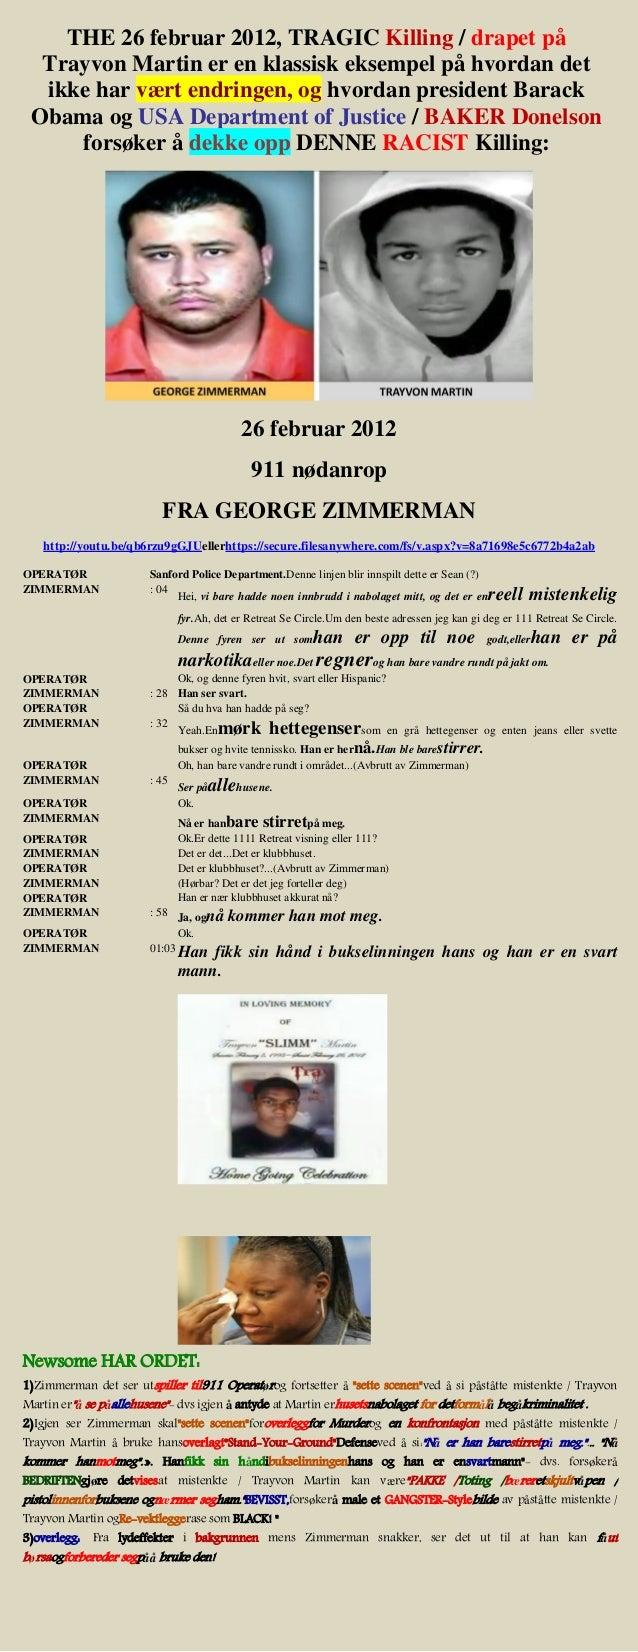 02 26-2012 george zimmerman emergency 911 call (norwegian)